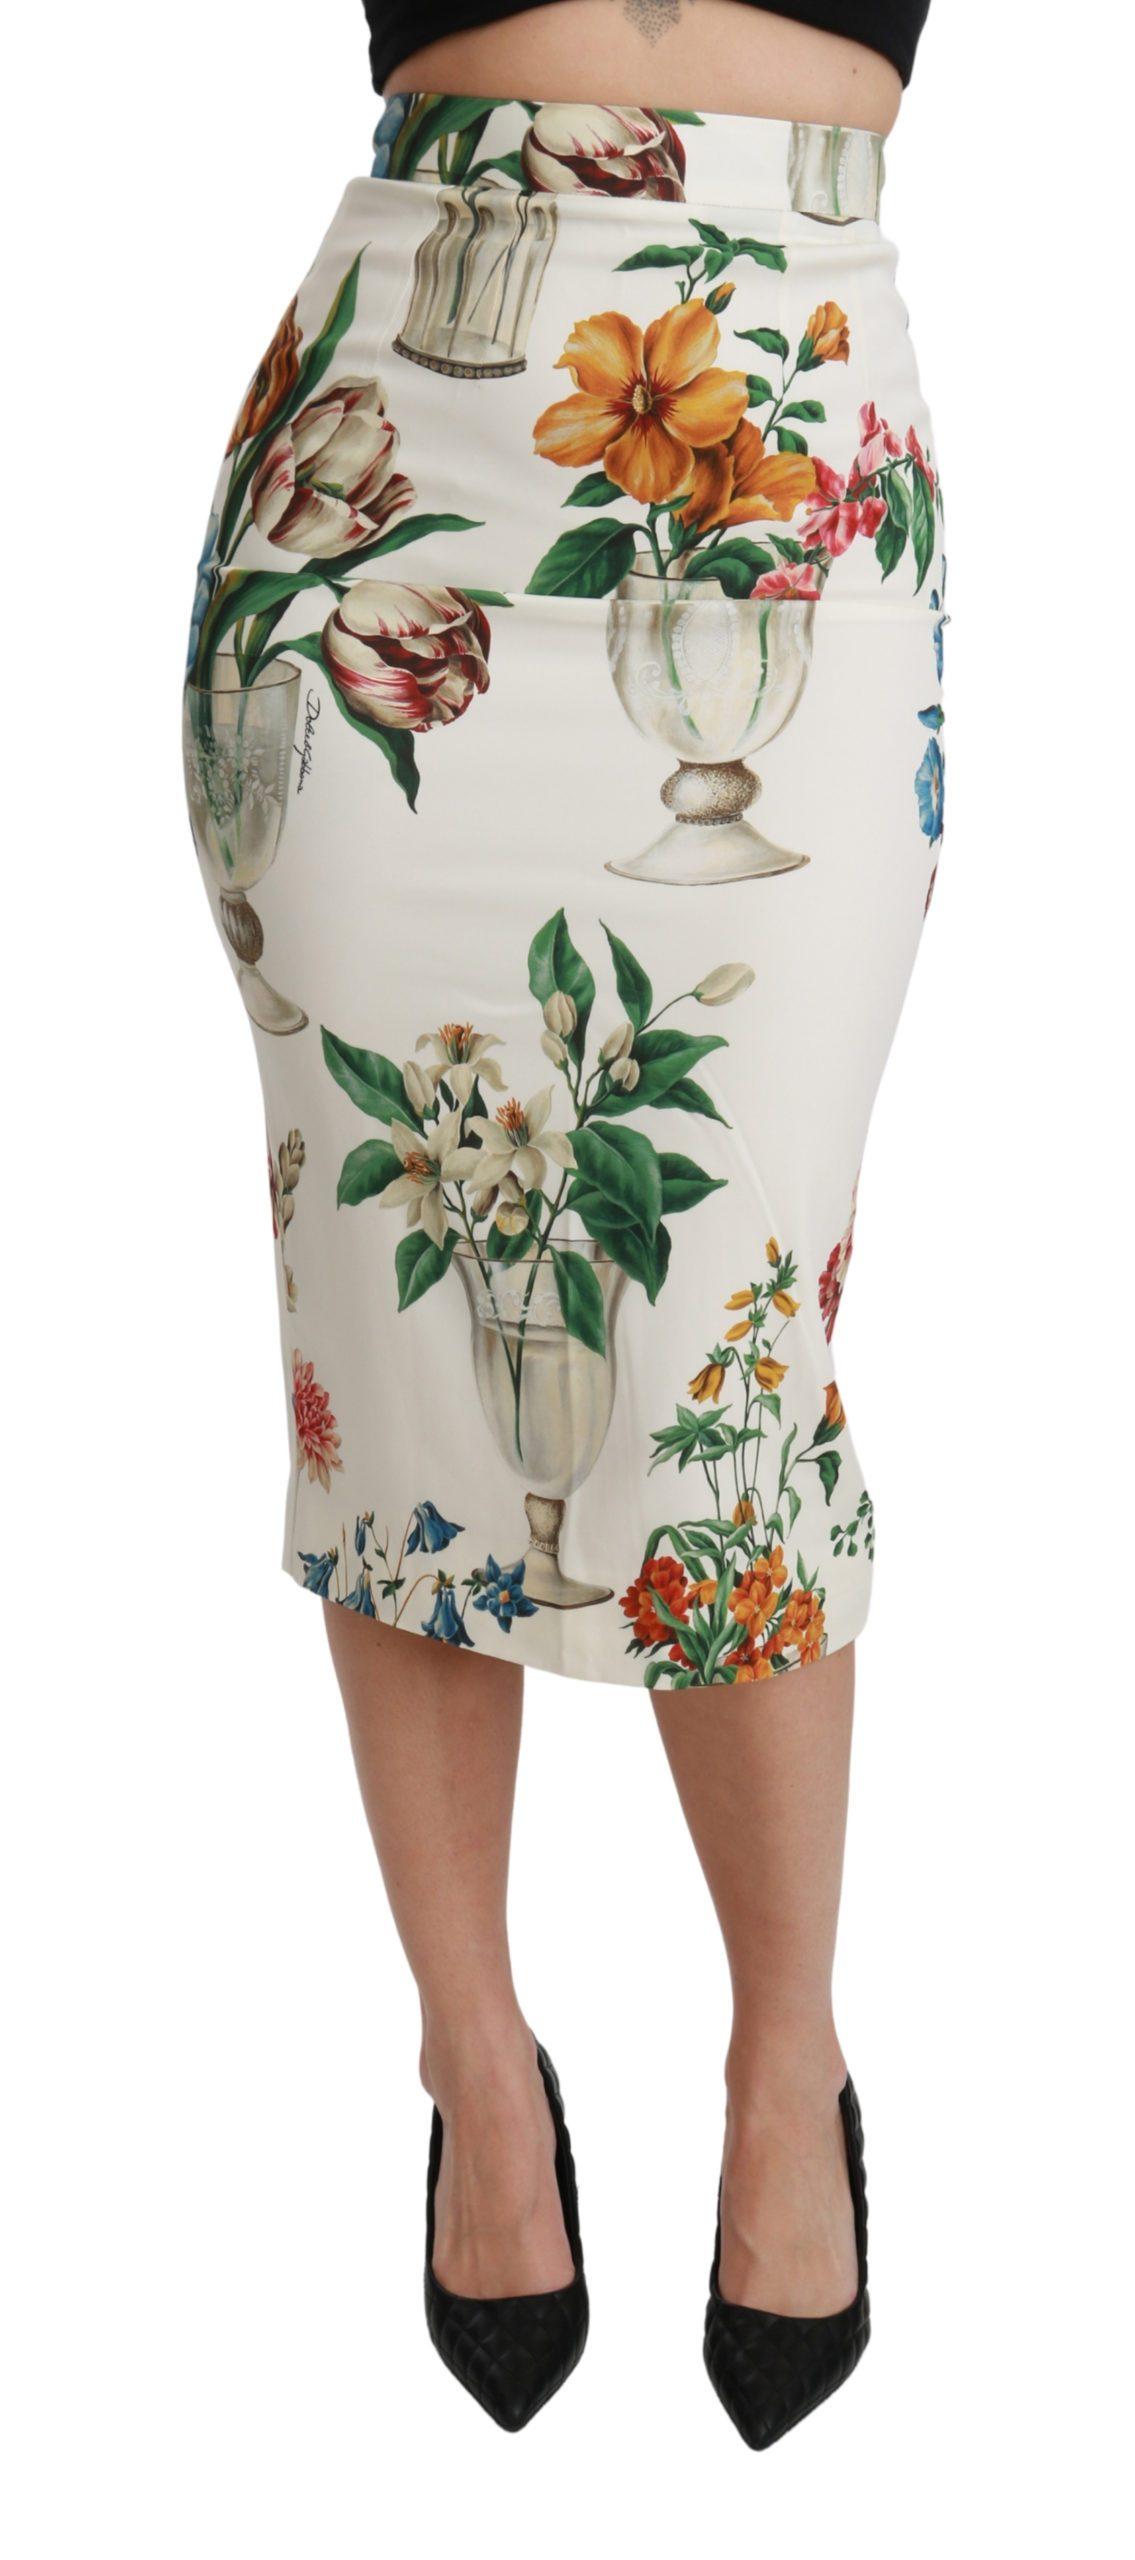 Dolce & Gabbana Women's Silk Stretch Flower Vase Skirt White SKI1434 - IT36 | XS